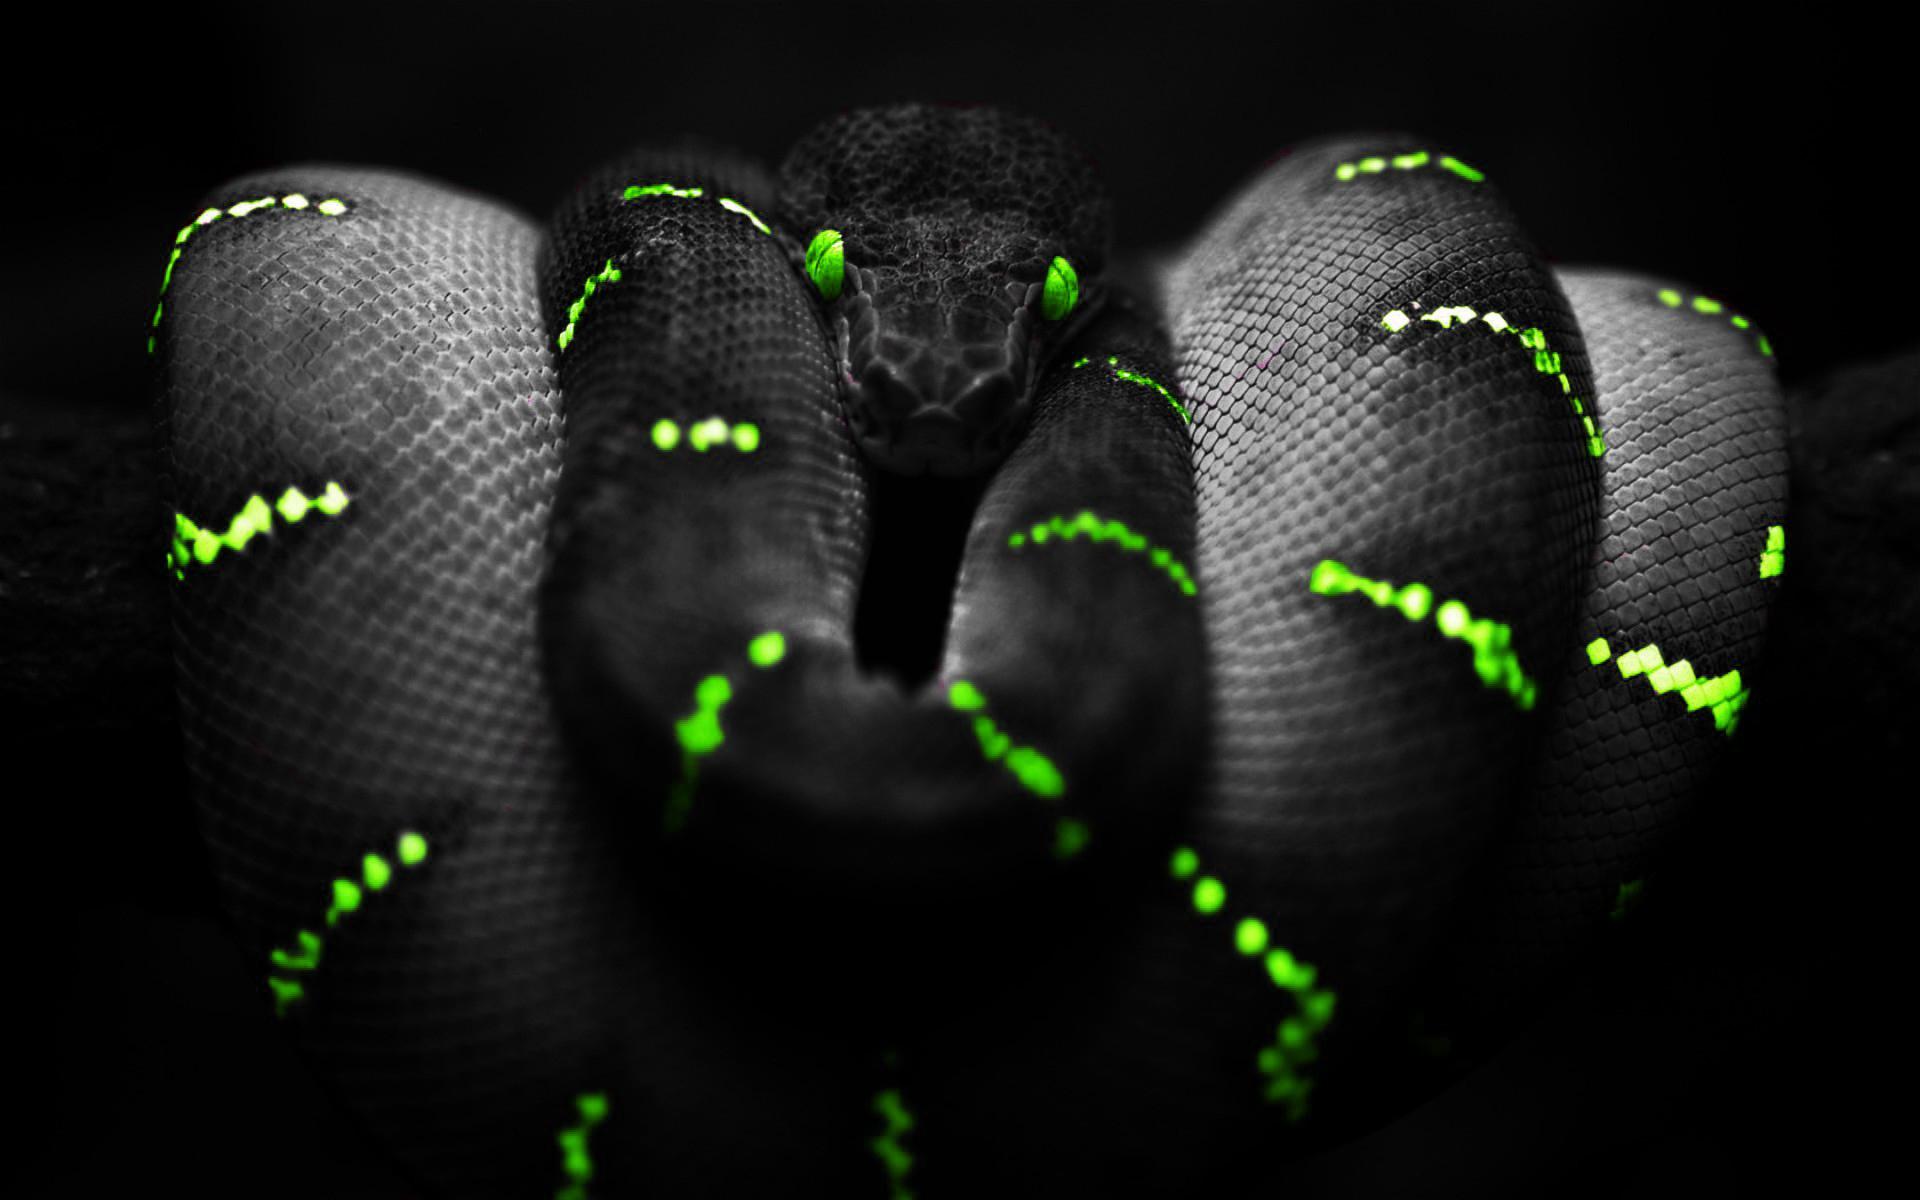 Black Python On The Wallpaper Desktop Wallpapers 1920x1200